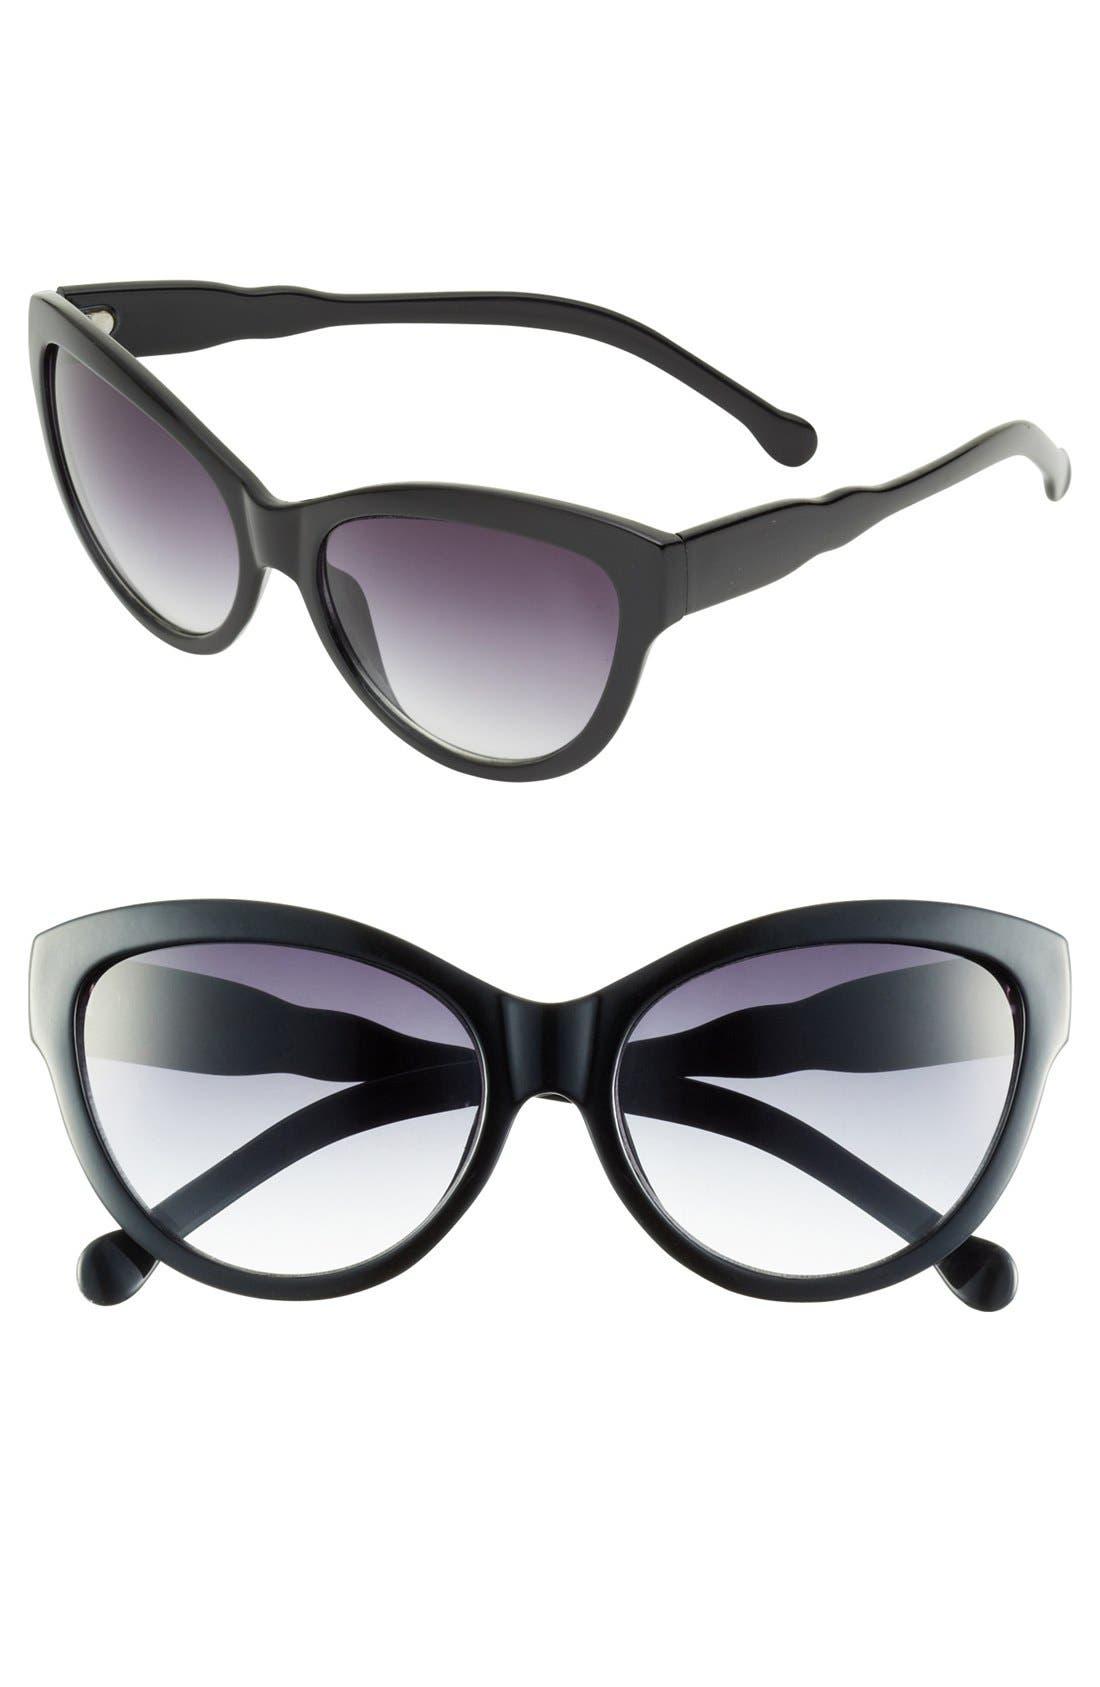 Main Image - Outlook Eyewear Sunglasses